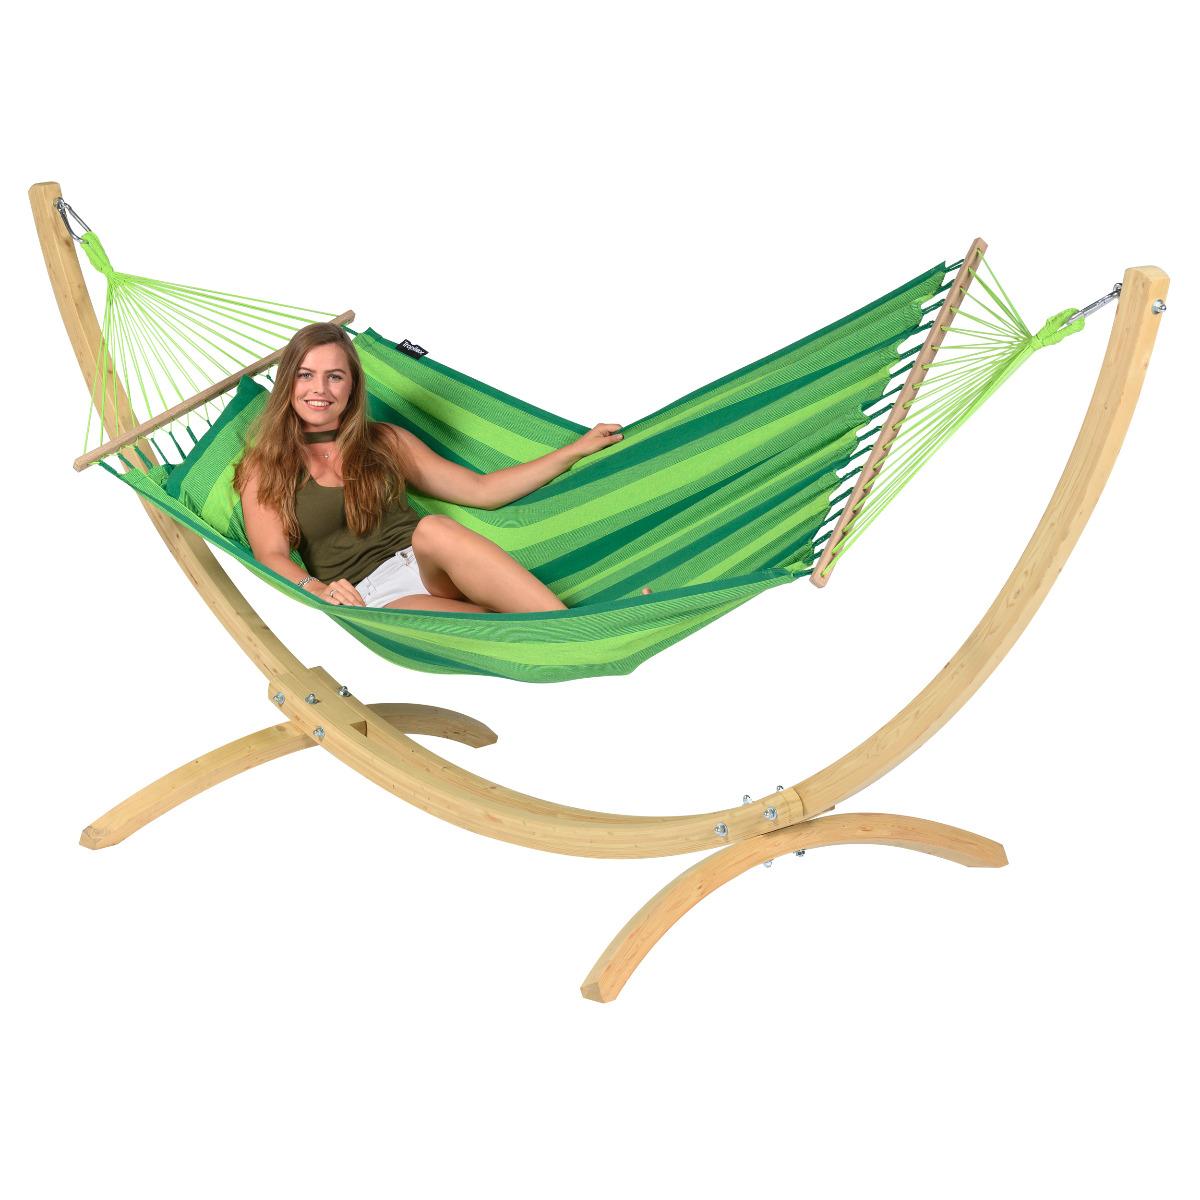 Hangmatset Single 'Wood & Relax' Green - Tropilex �